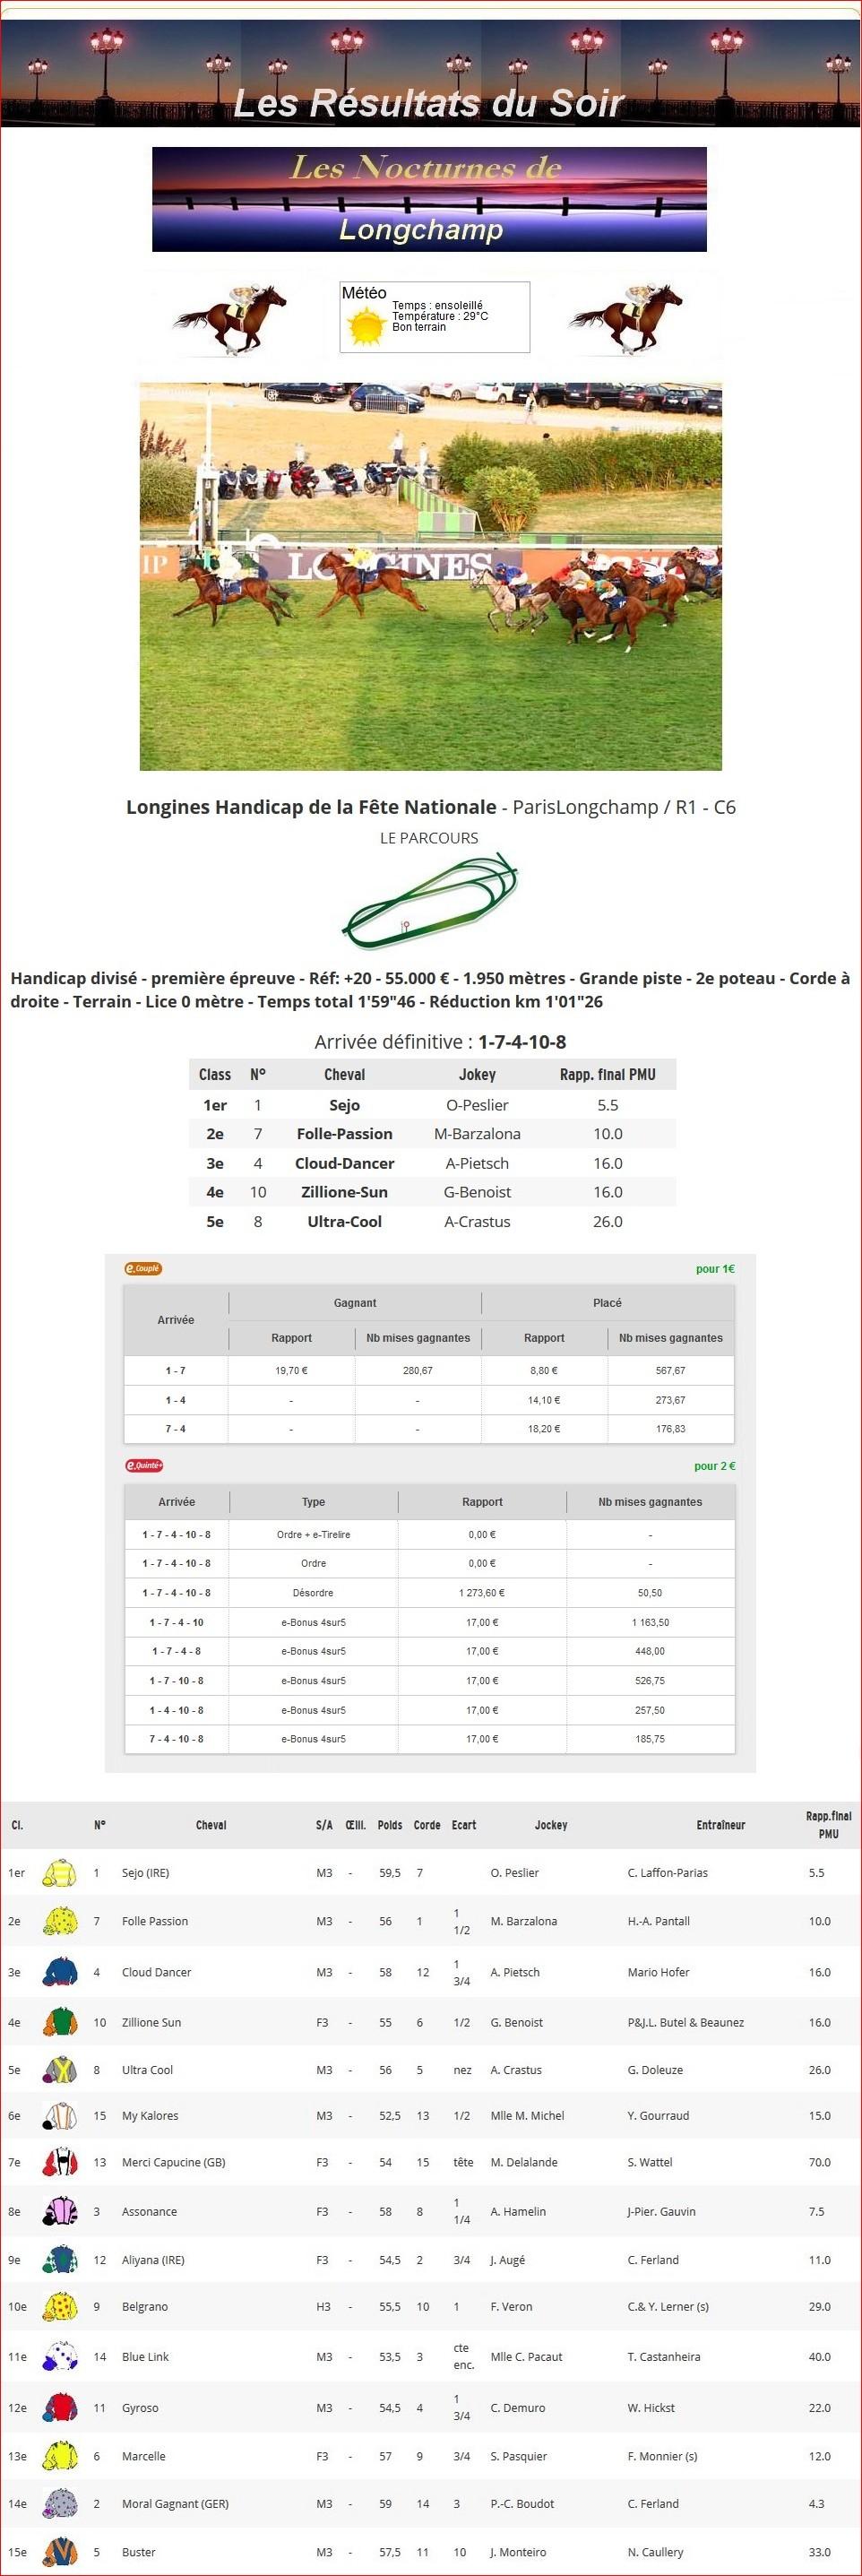 Résultats du Samedi 14/07/2018   1_p-t_44